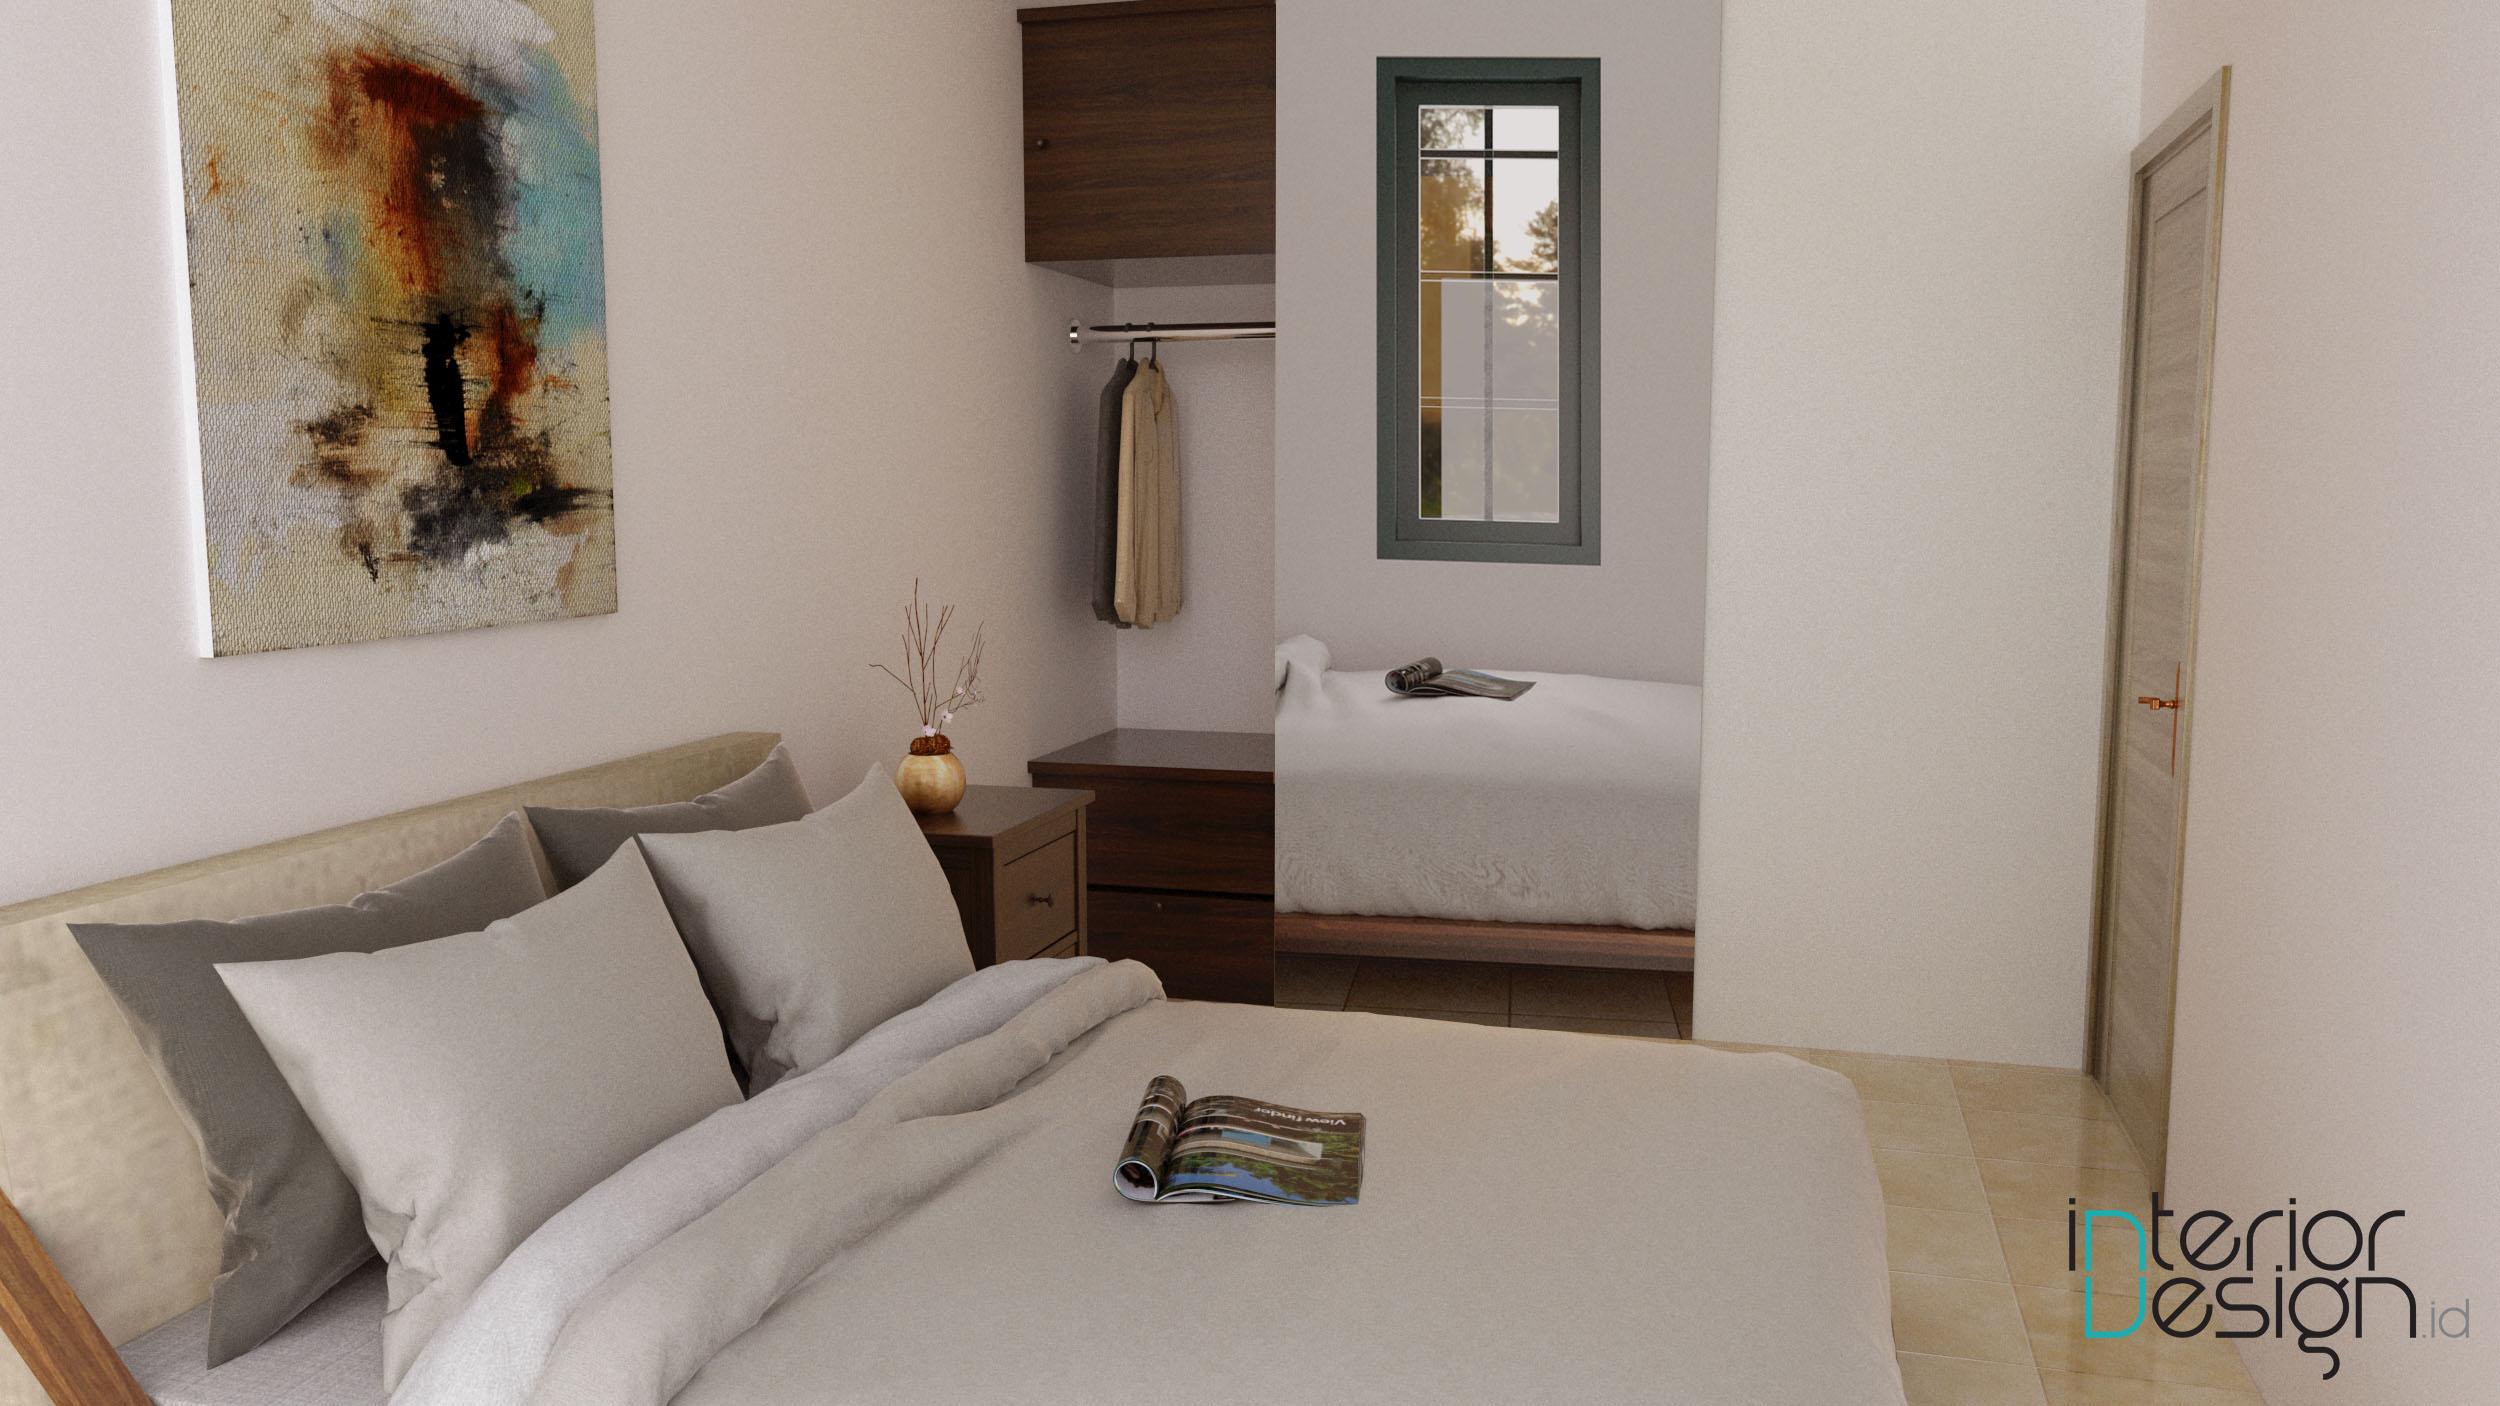 kamar tidur - sentul, bogor | interiordesign.id